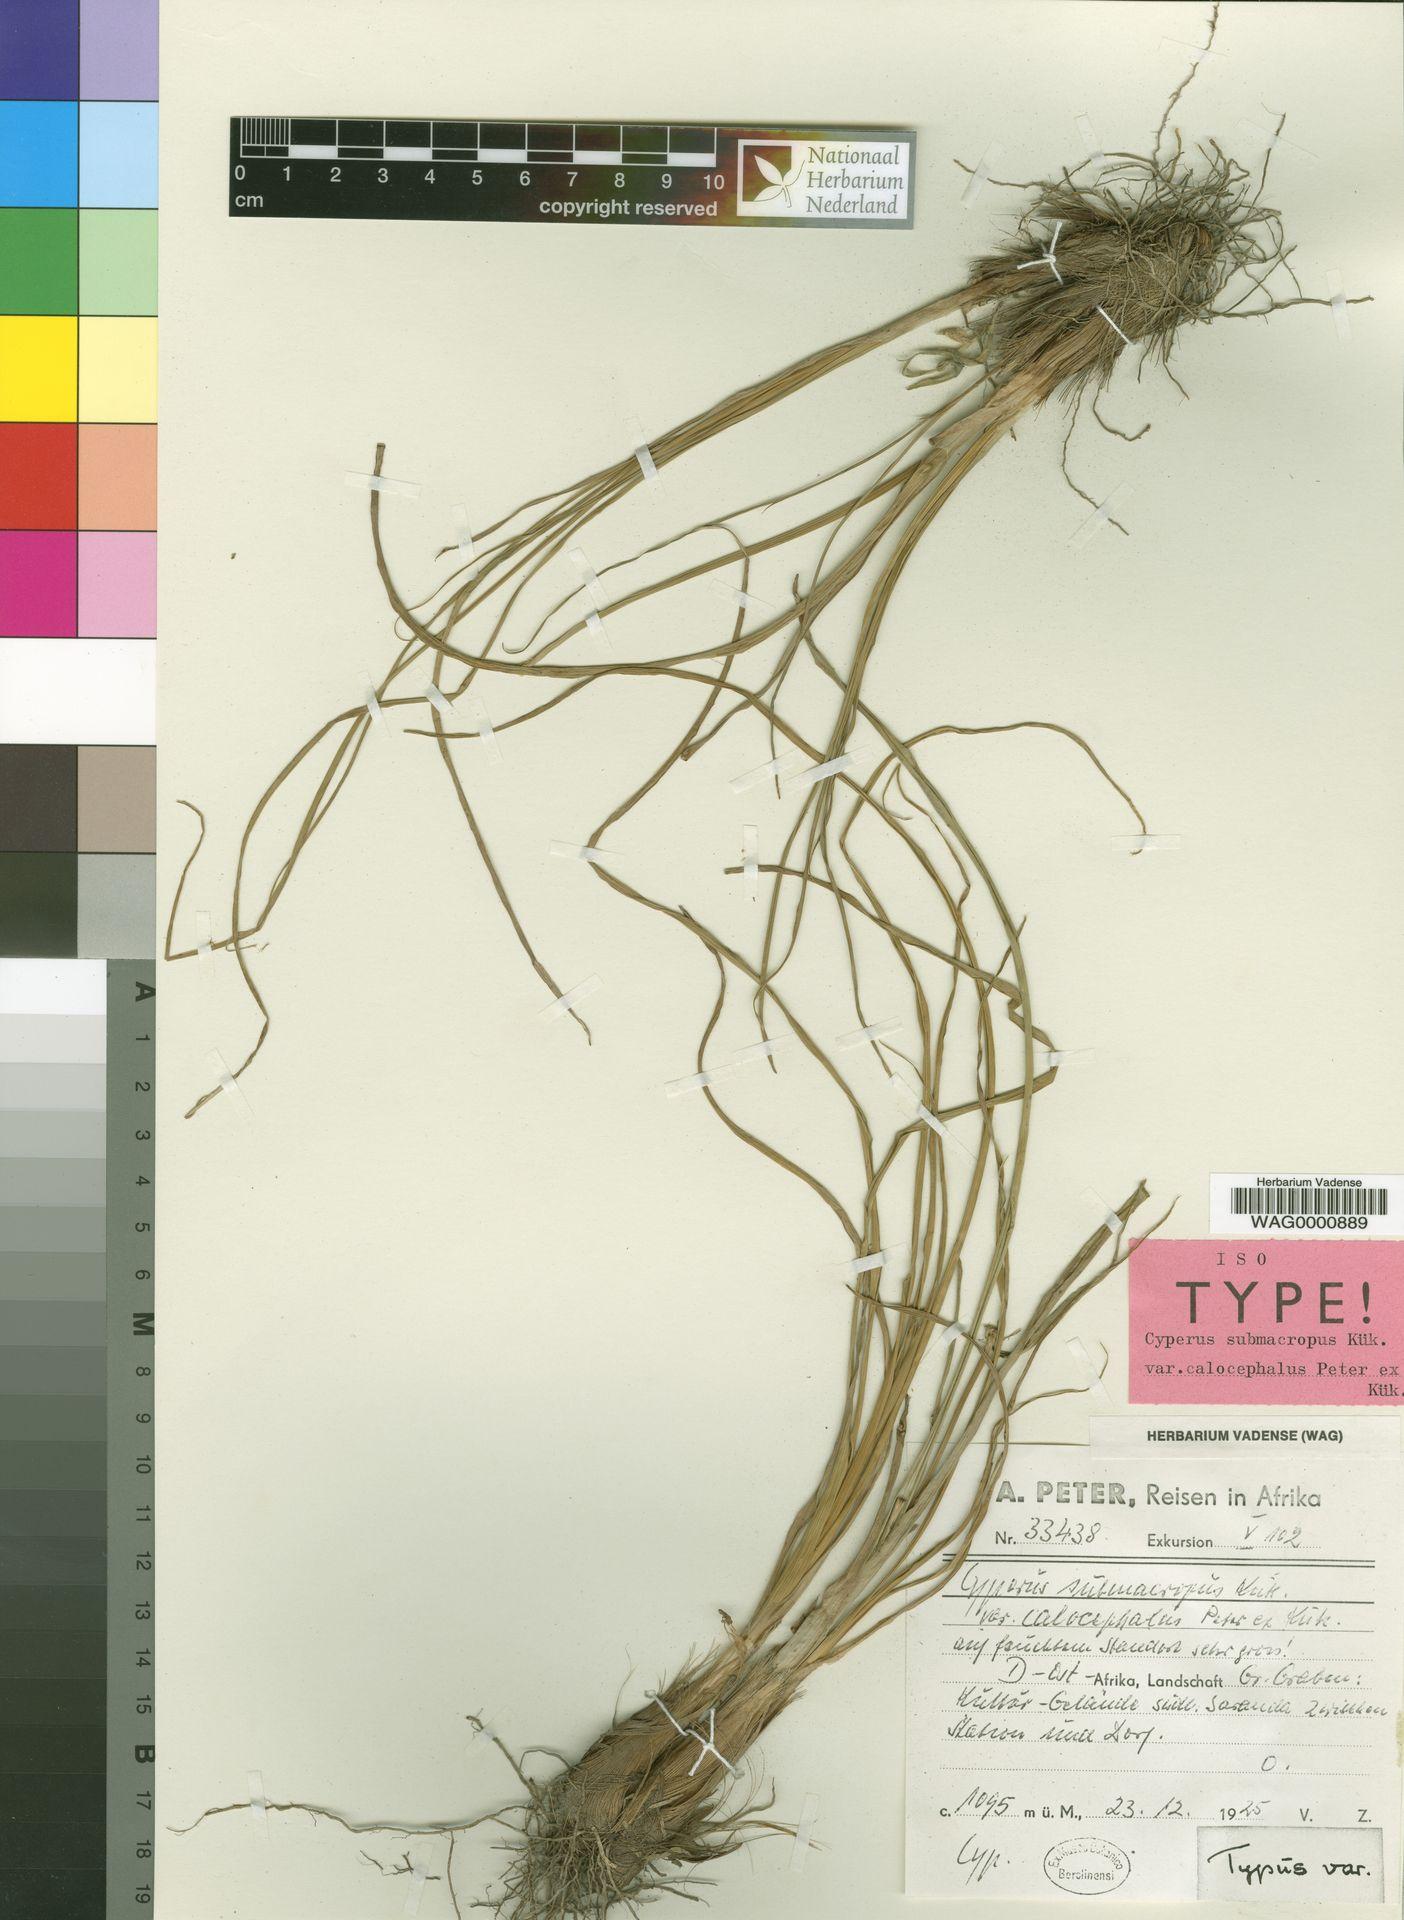 WAG.1765675 | Cyperus submacropus var. calocephalus Peter ex Kük.